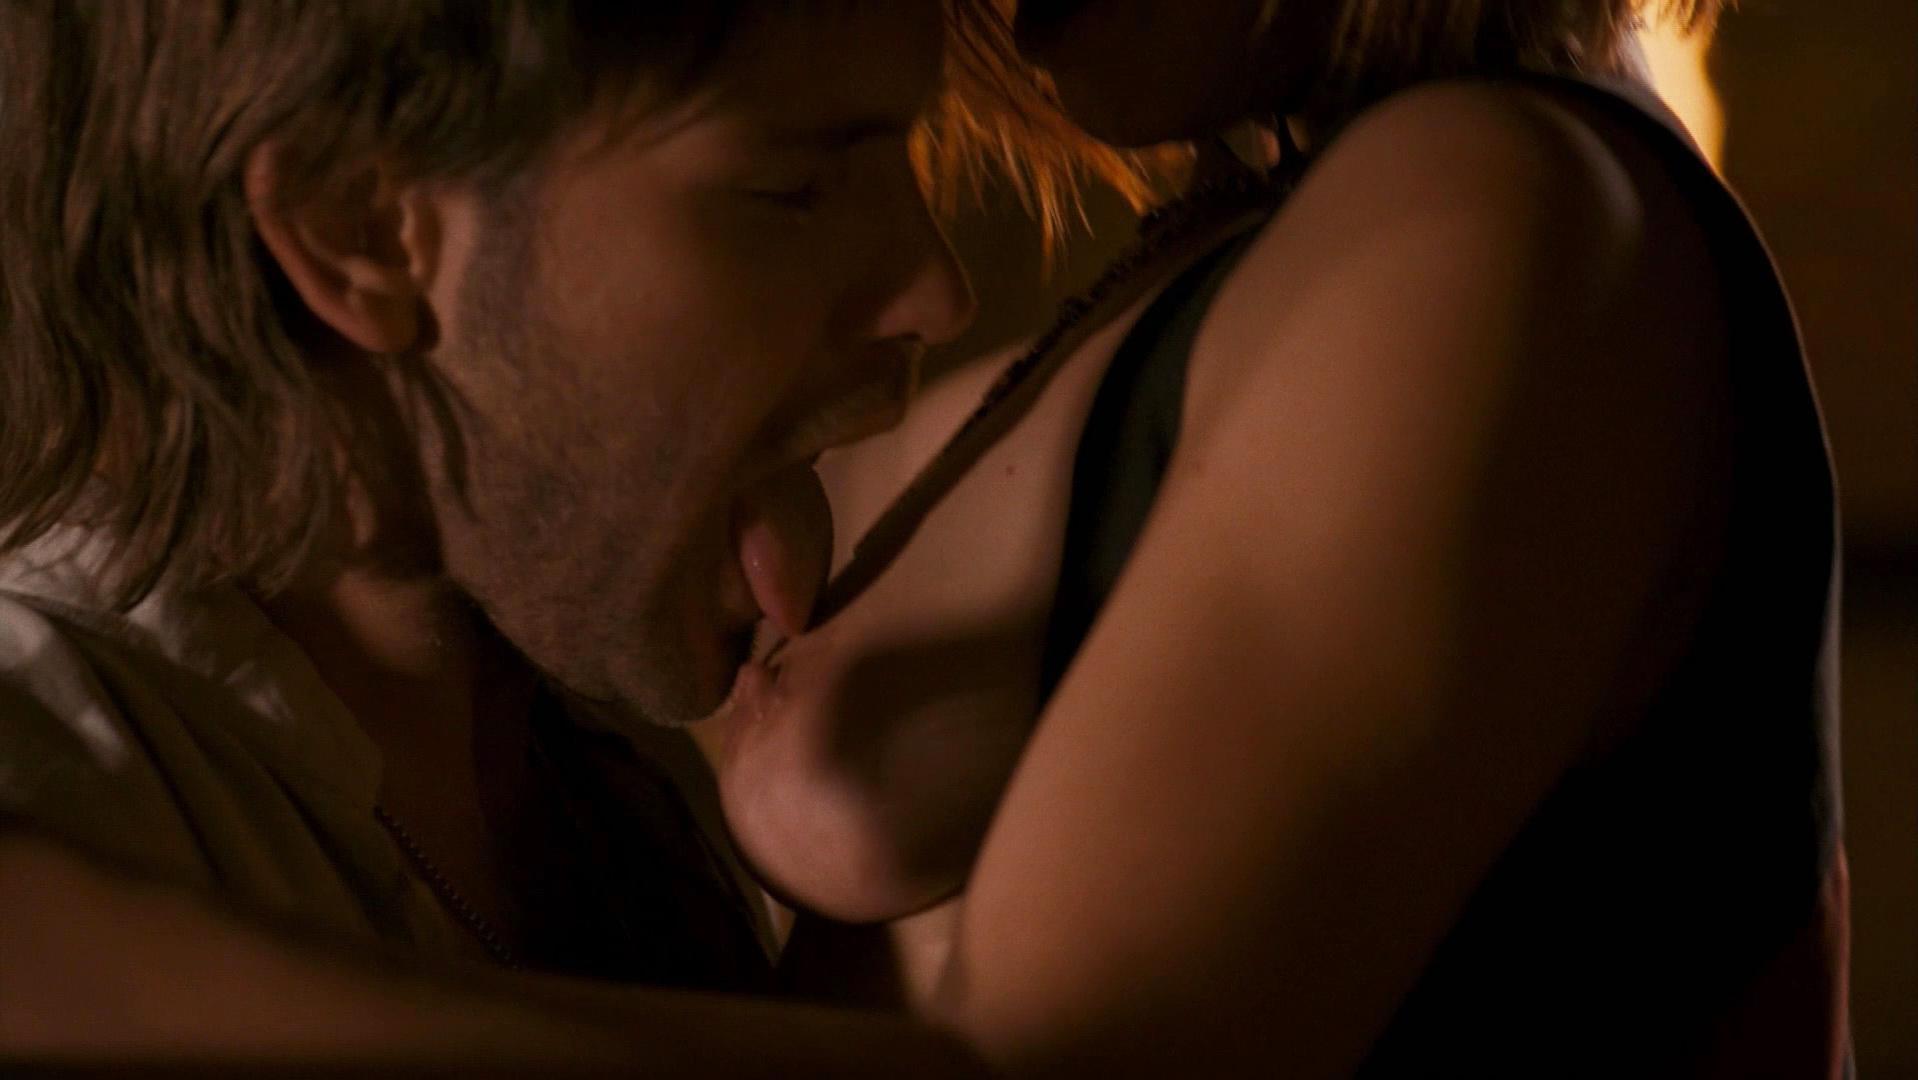 Bloodrayne from kristanna loken scene sex topless